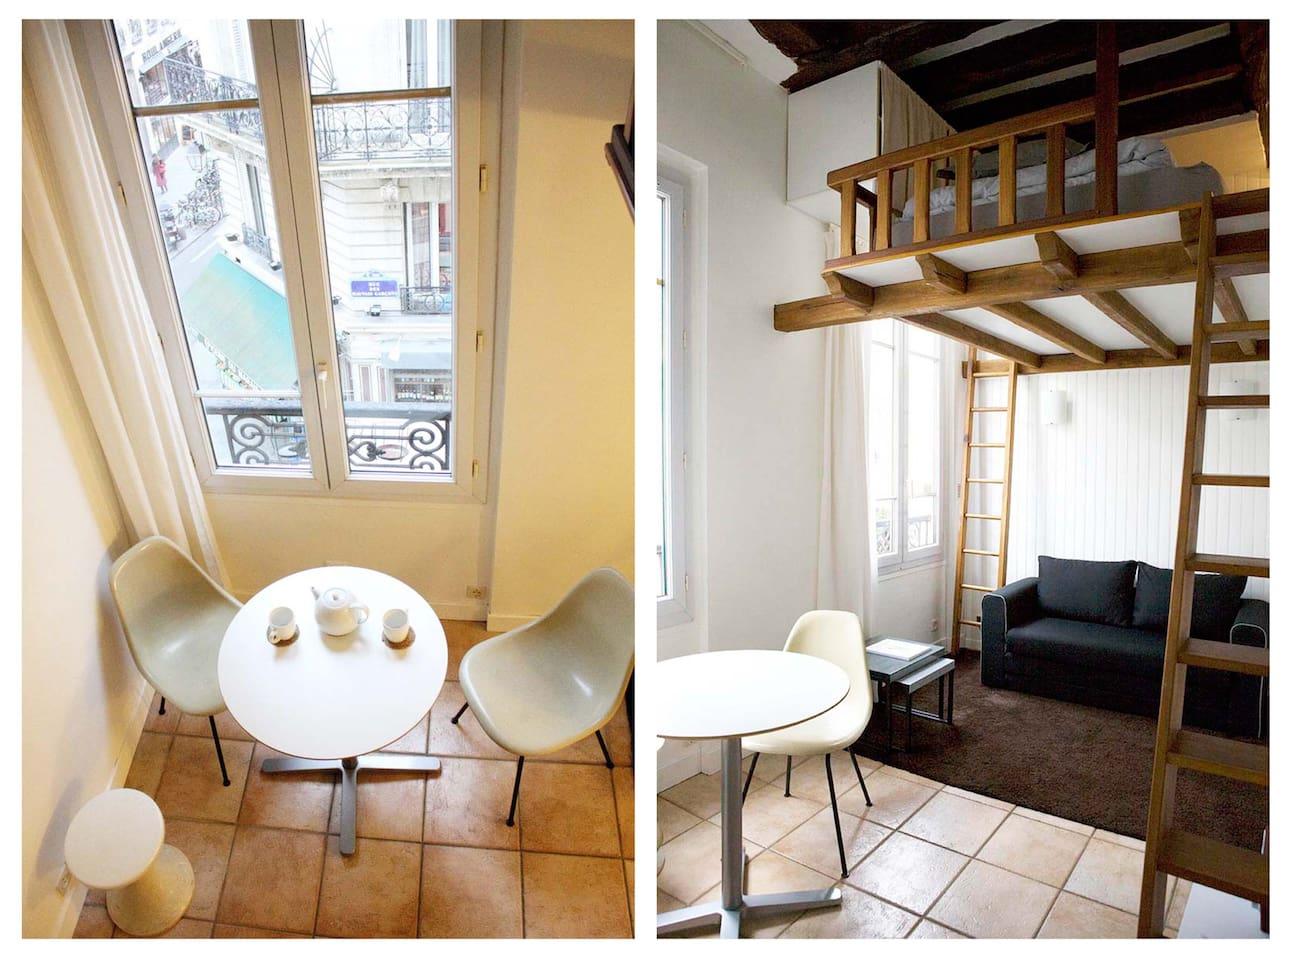 VERY COSY! Studio in MARAIS PARIS